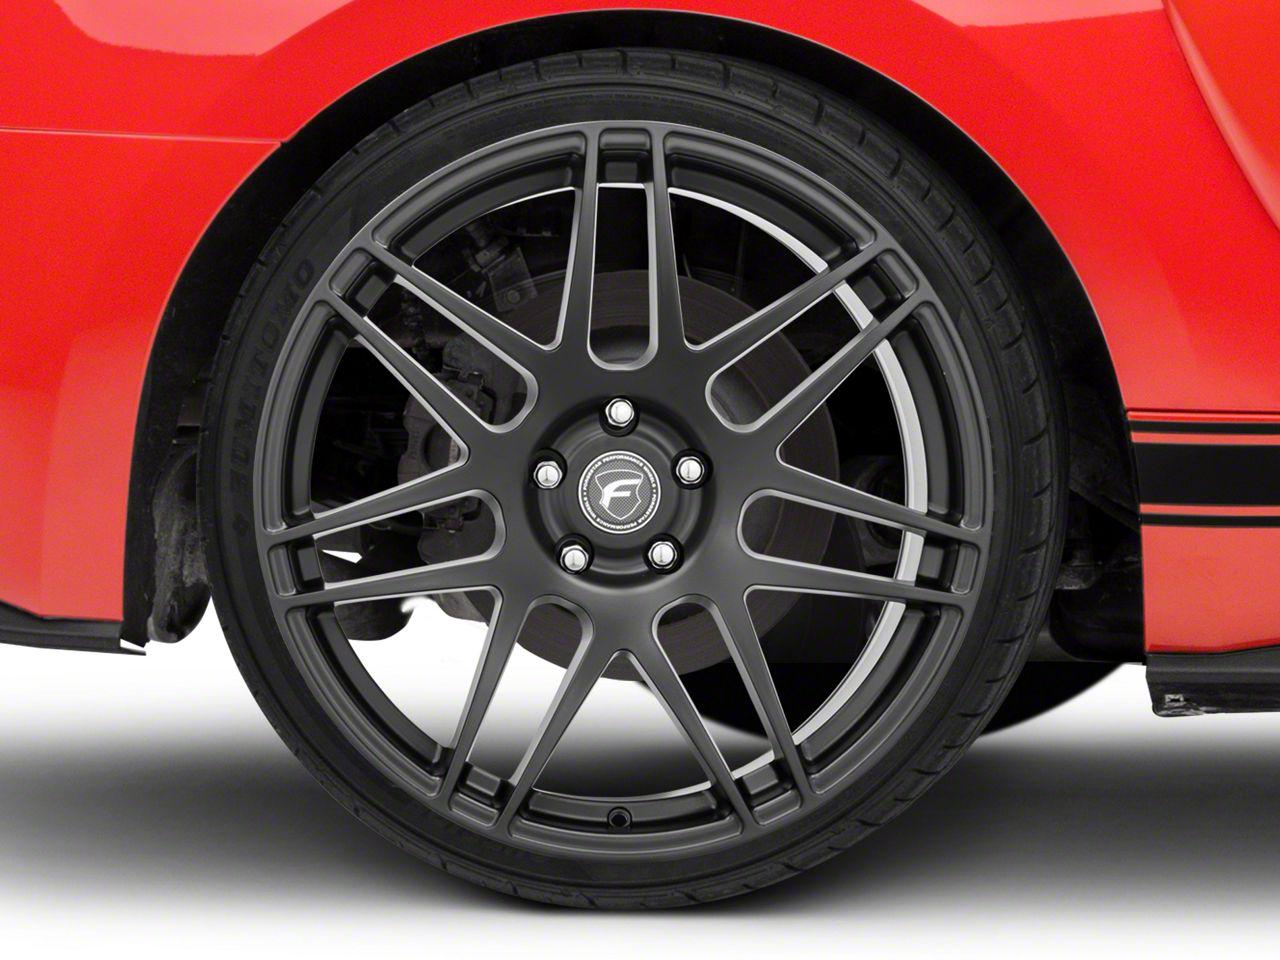 Forgestar F14 Monoblock Deep Concave Monoblock Matte Black Wheel - 20x11 - Rear Only (15-19 GT, EcoBoost, V6)